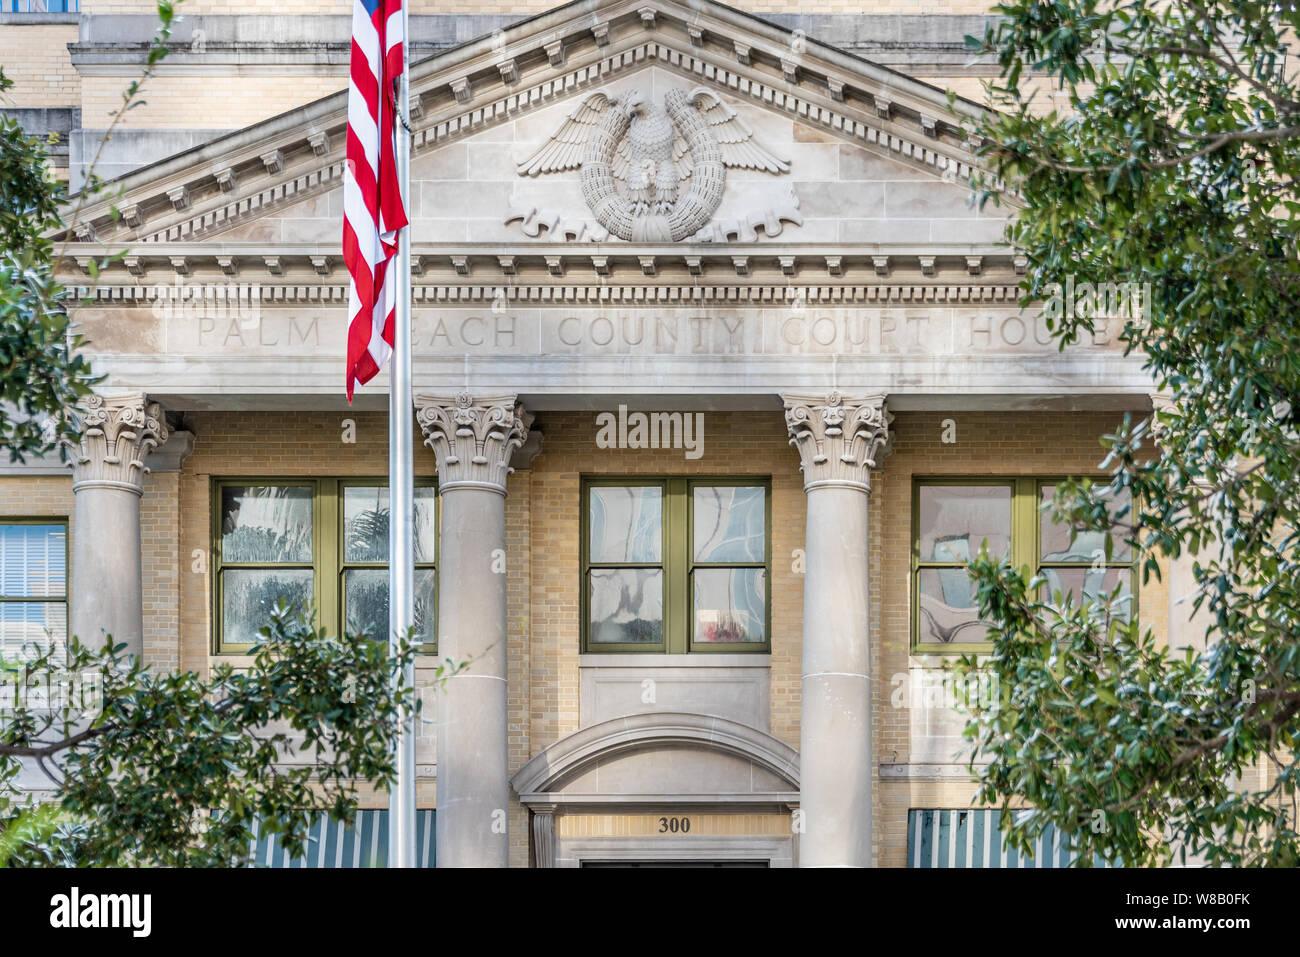 Johnson County Stock Photos & Johnson County Stock Images